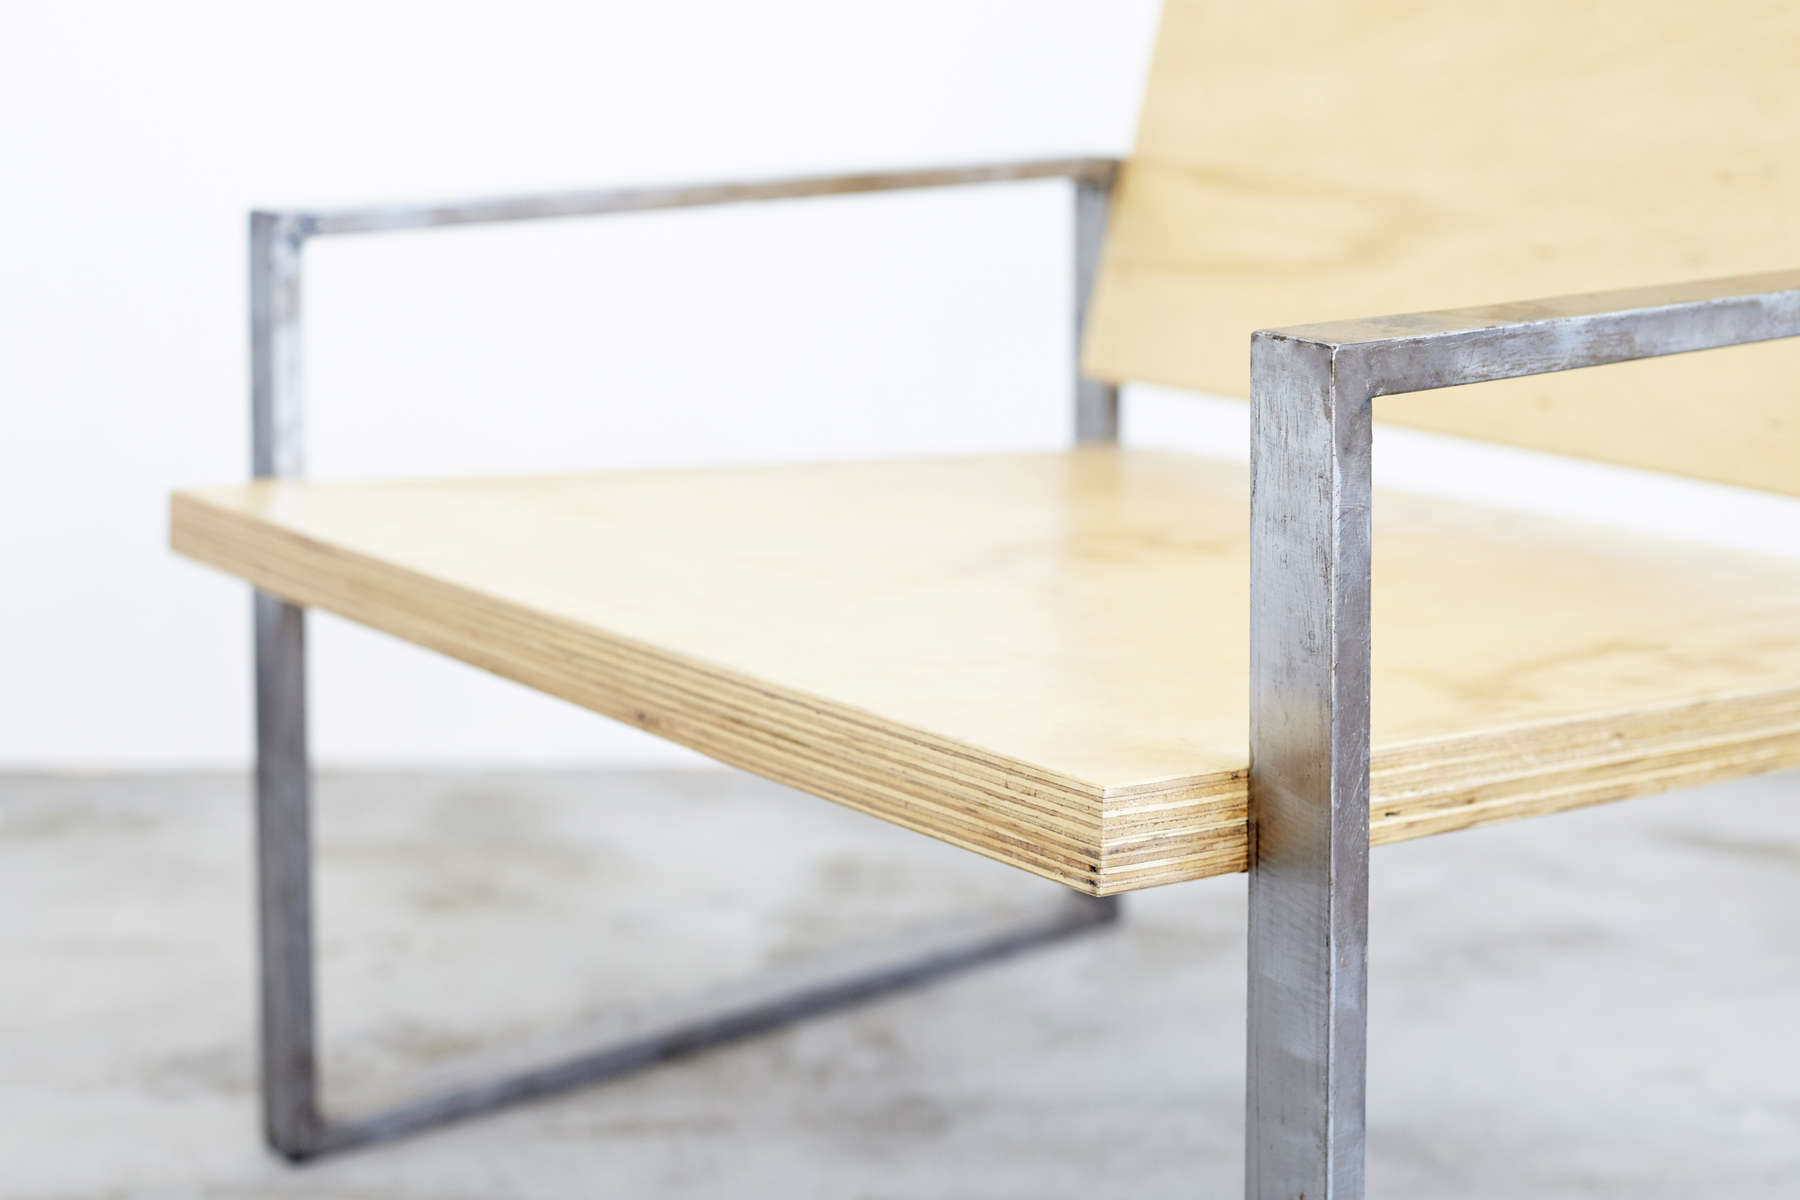 17_0913_AN_Cadeira-BF-381